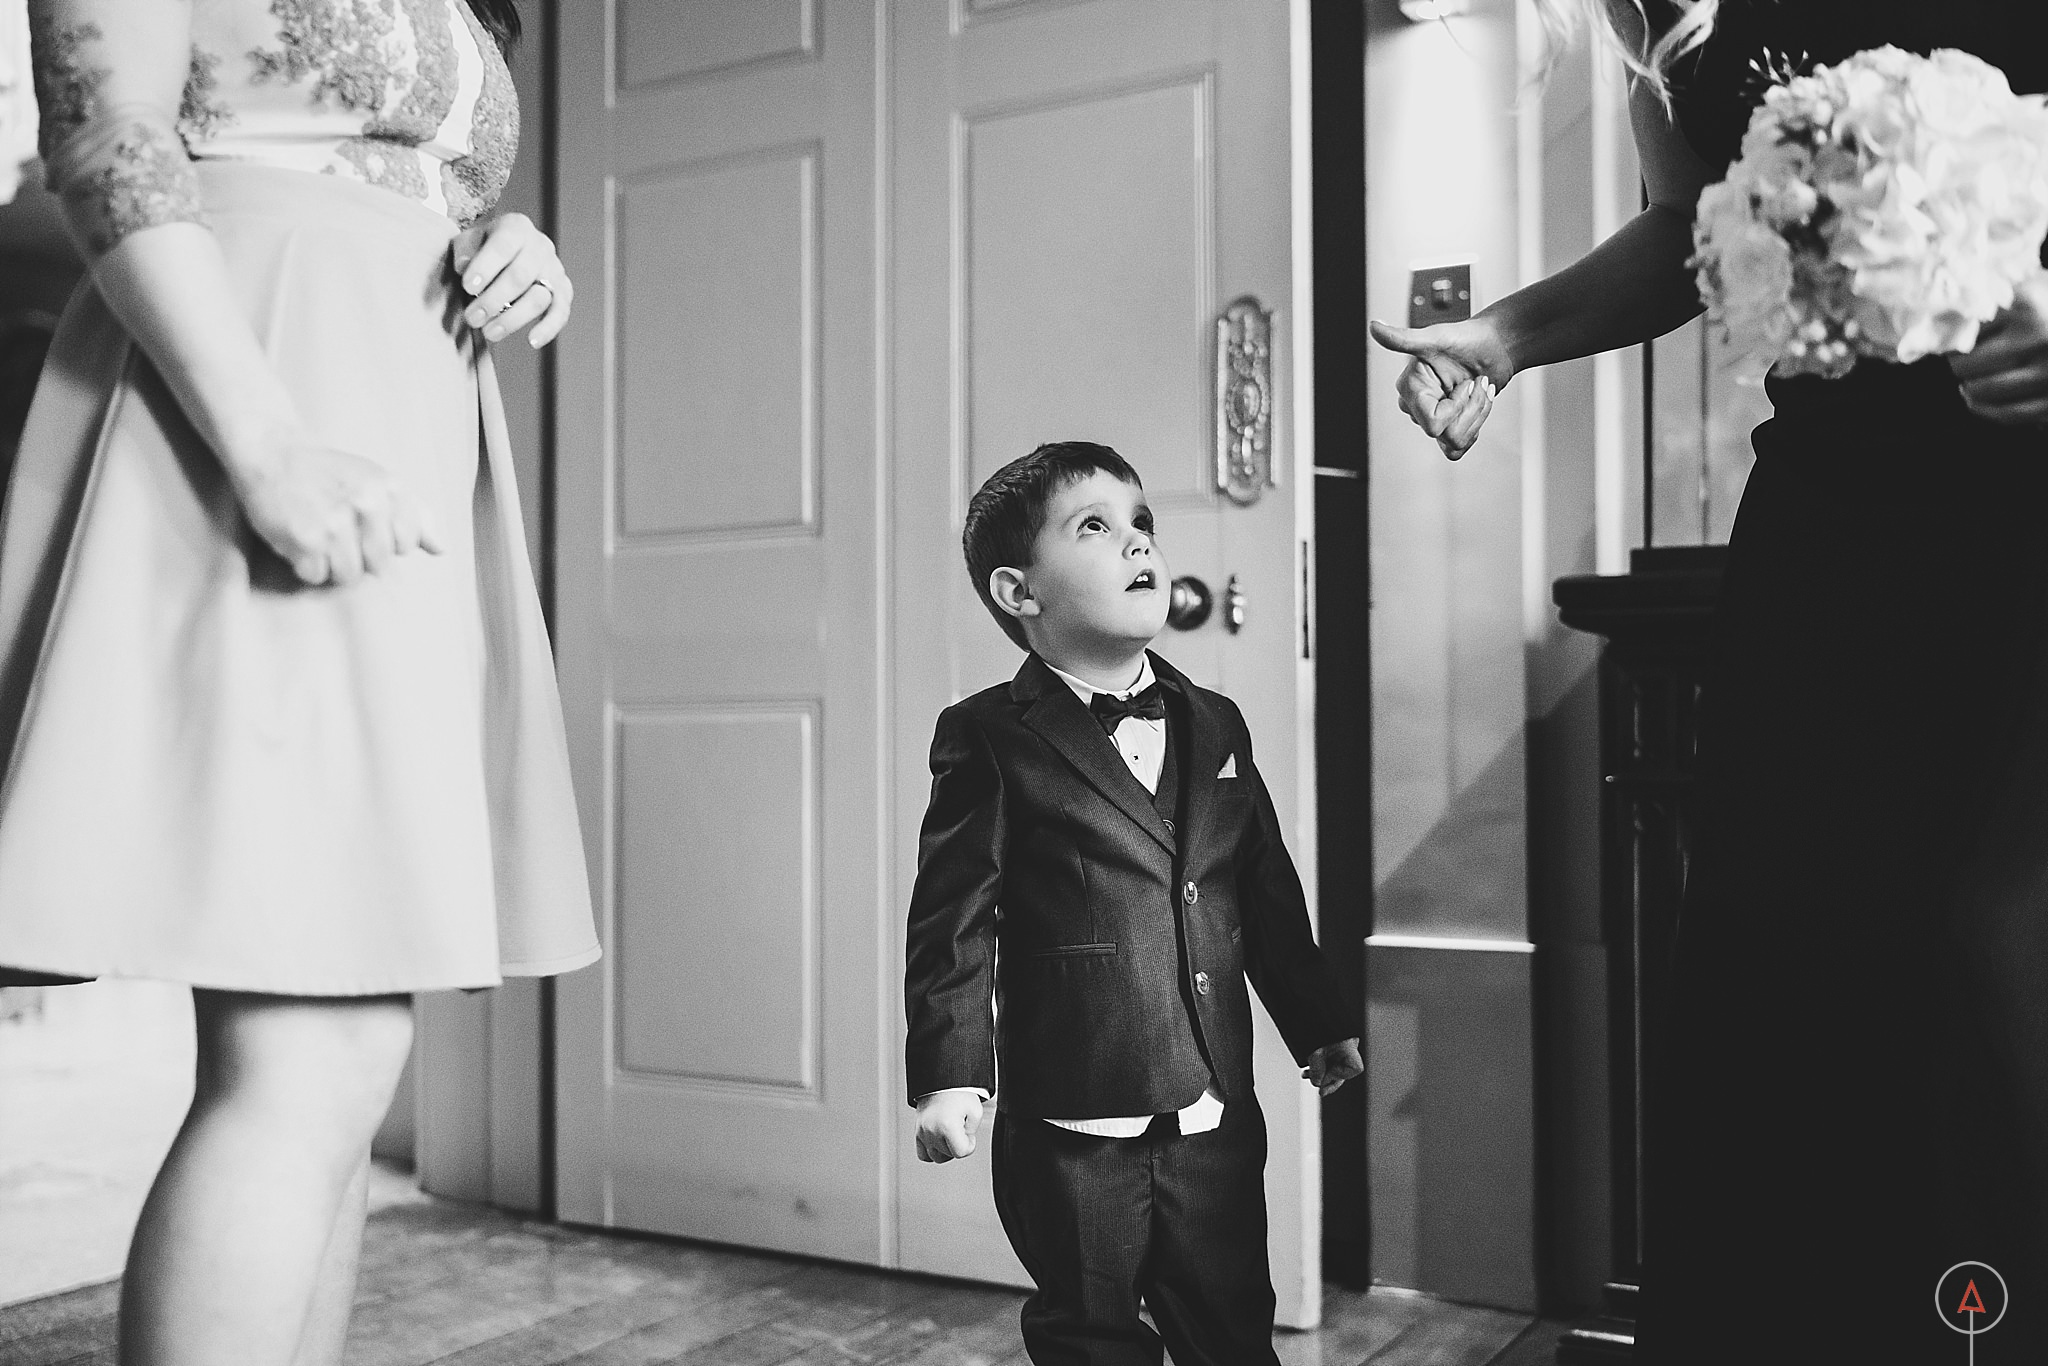 cardiff-wedding-photographer-aga-tomaszek_0250